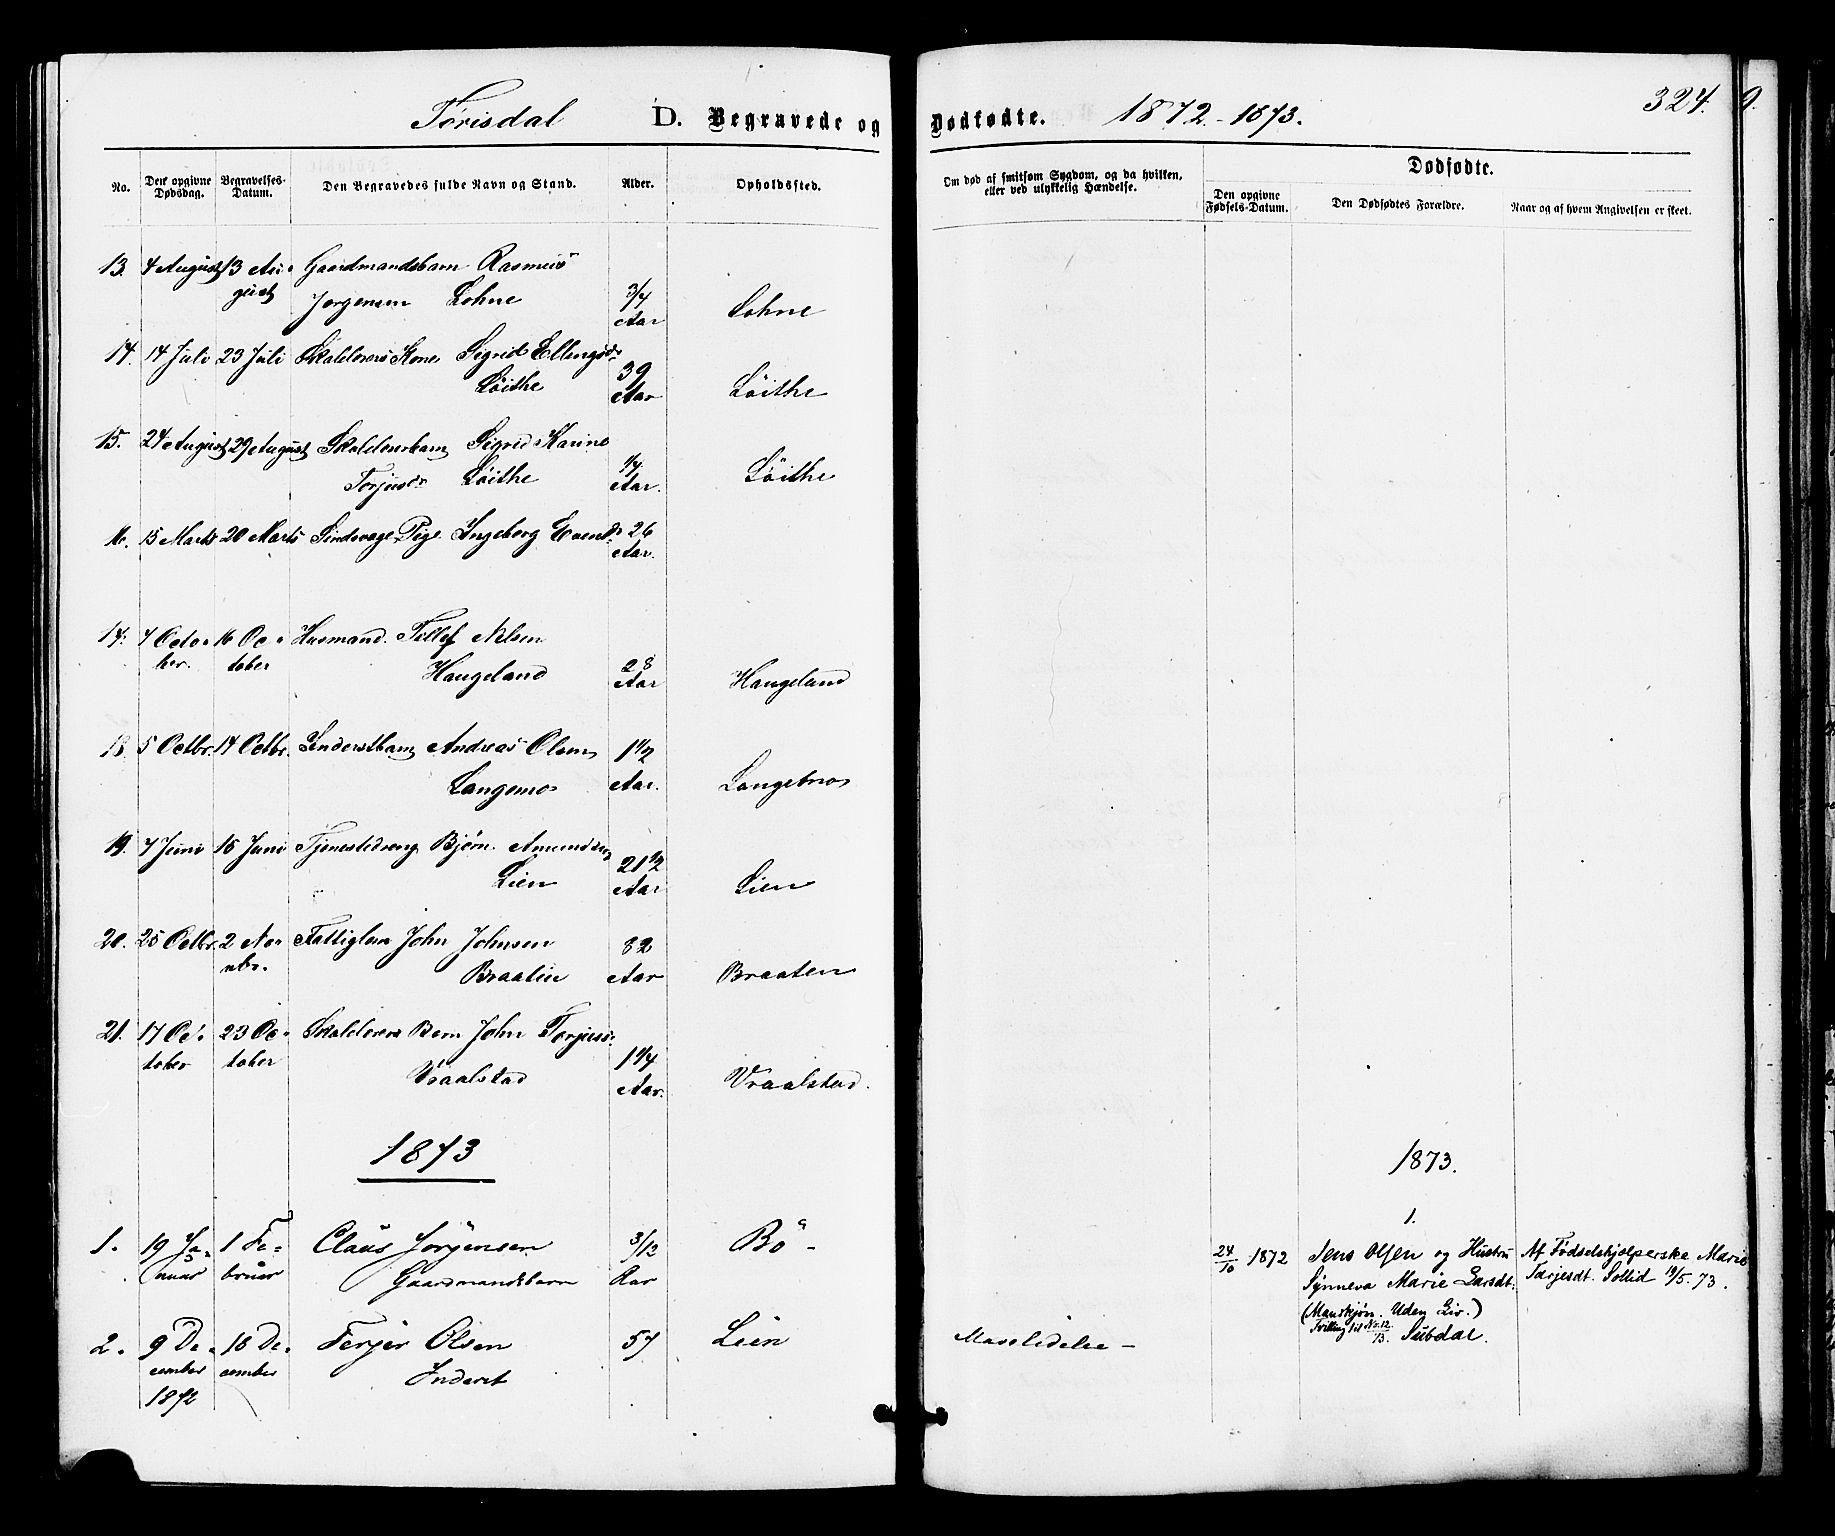 SAKO, Drangedal kirkebøker, F/Fa/L0009: Ministerialbok nr. 9 /2, 1872-1884, s. 324